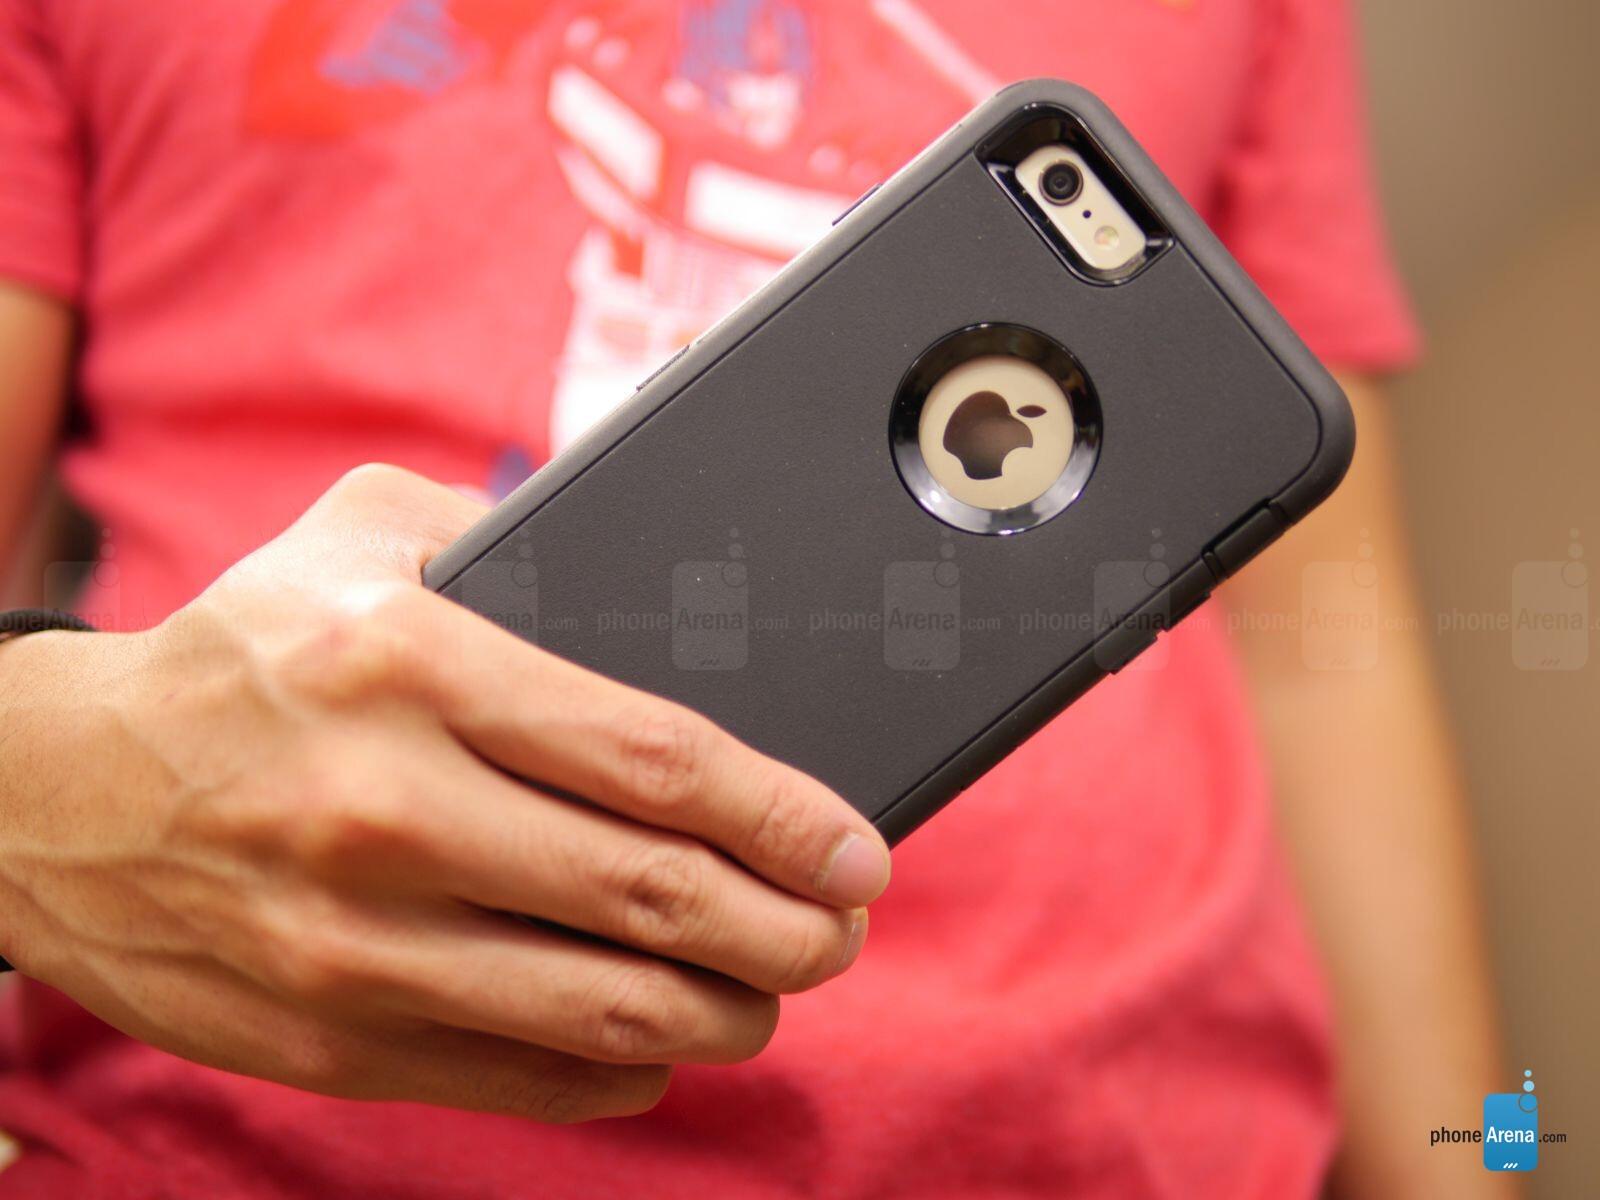 Ot otterbox iphone 6s plus covers - 1 2